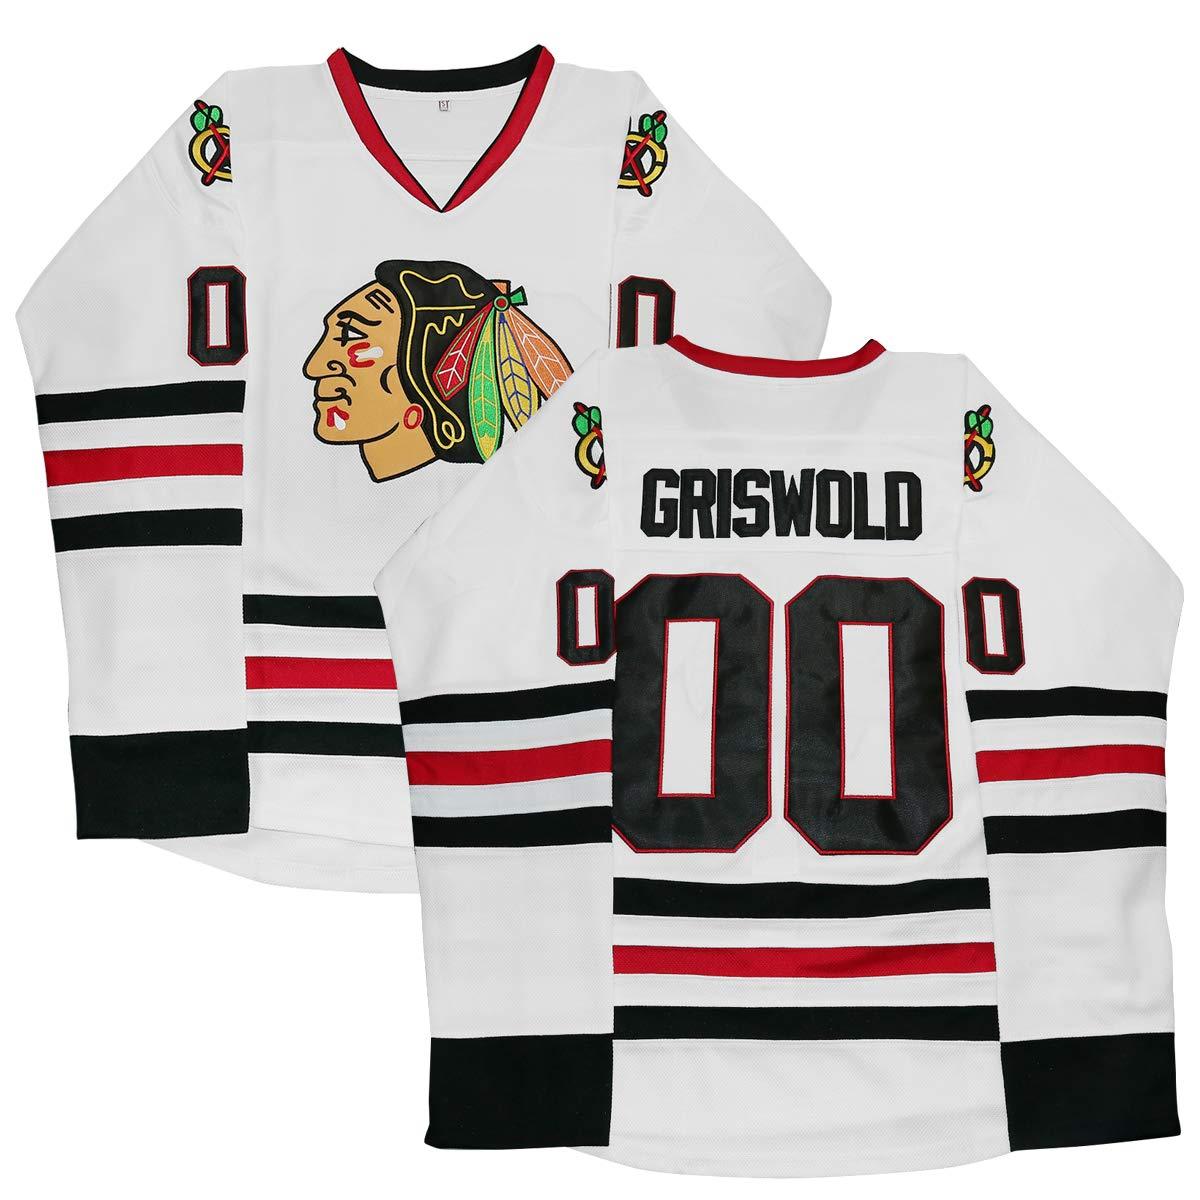 buy online 3f0c1 3b31a Clark Griswold Jersey,#00 X-Mas Christmas Vacation Movie Hockey Jersey  Stitched Men Ice Hockey Jerseys